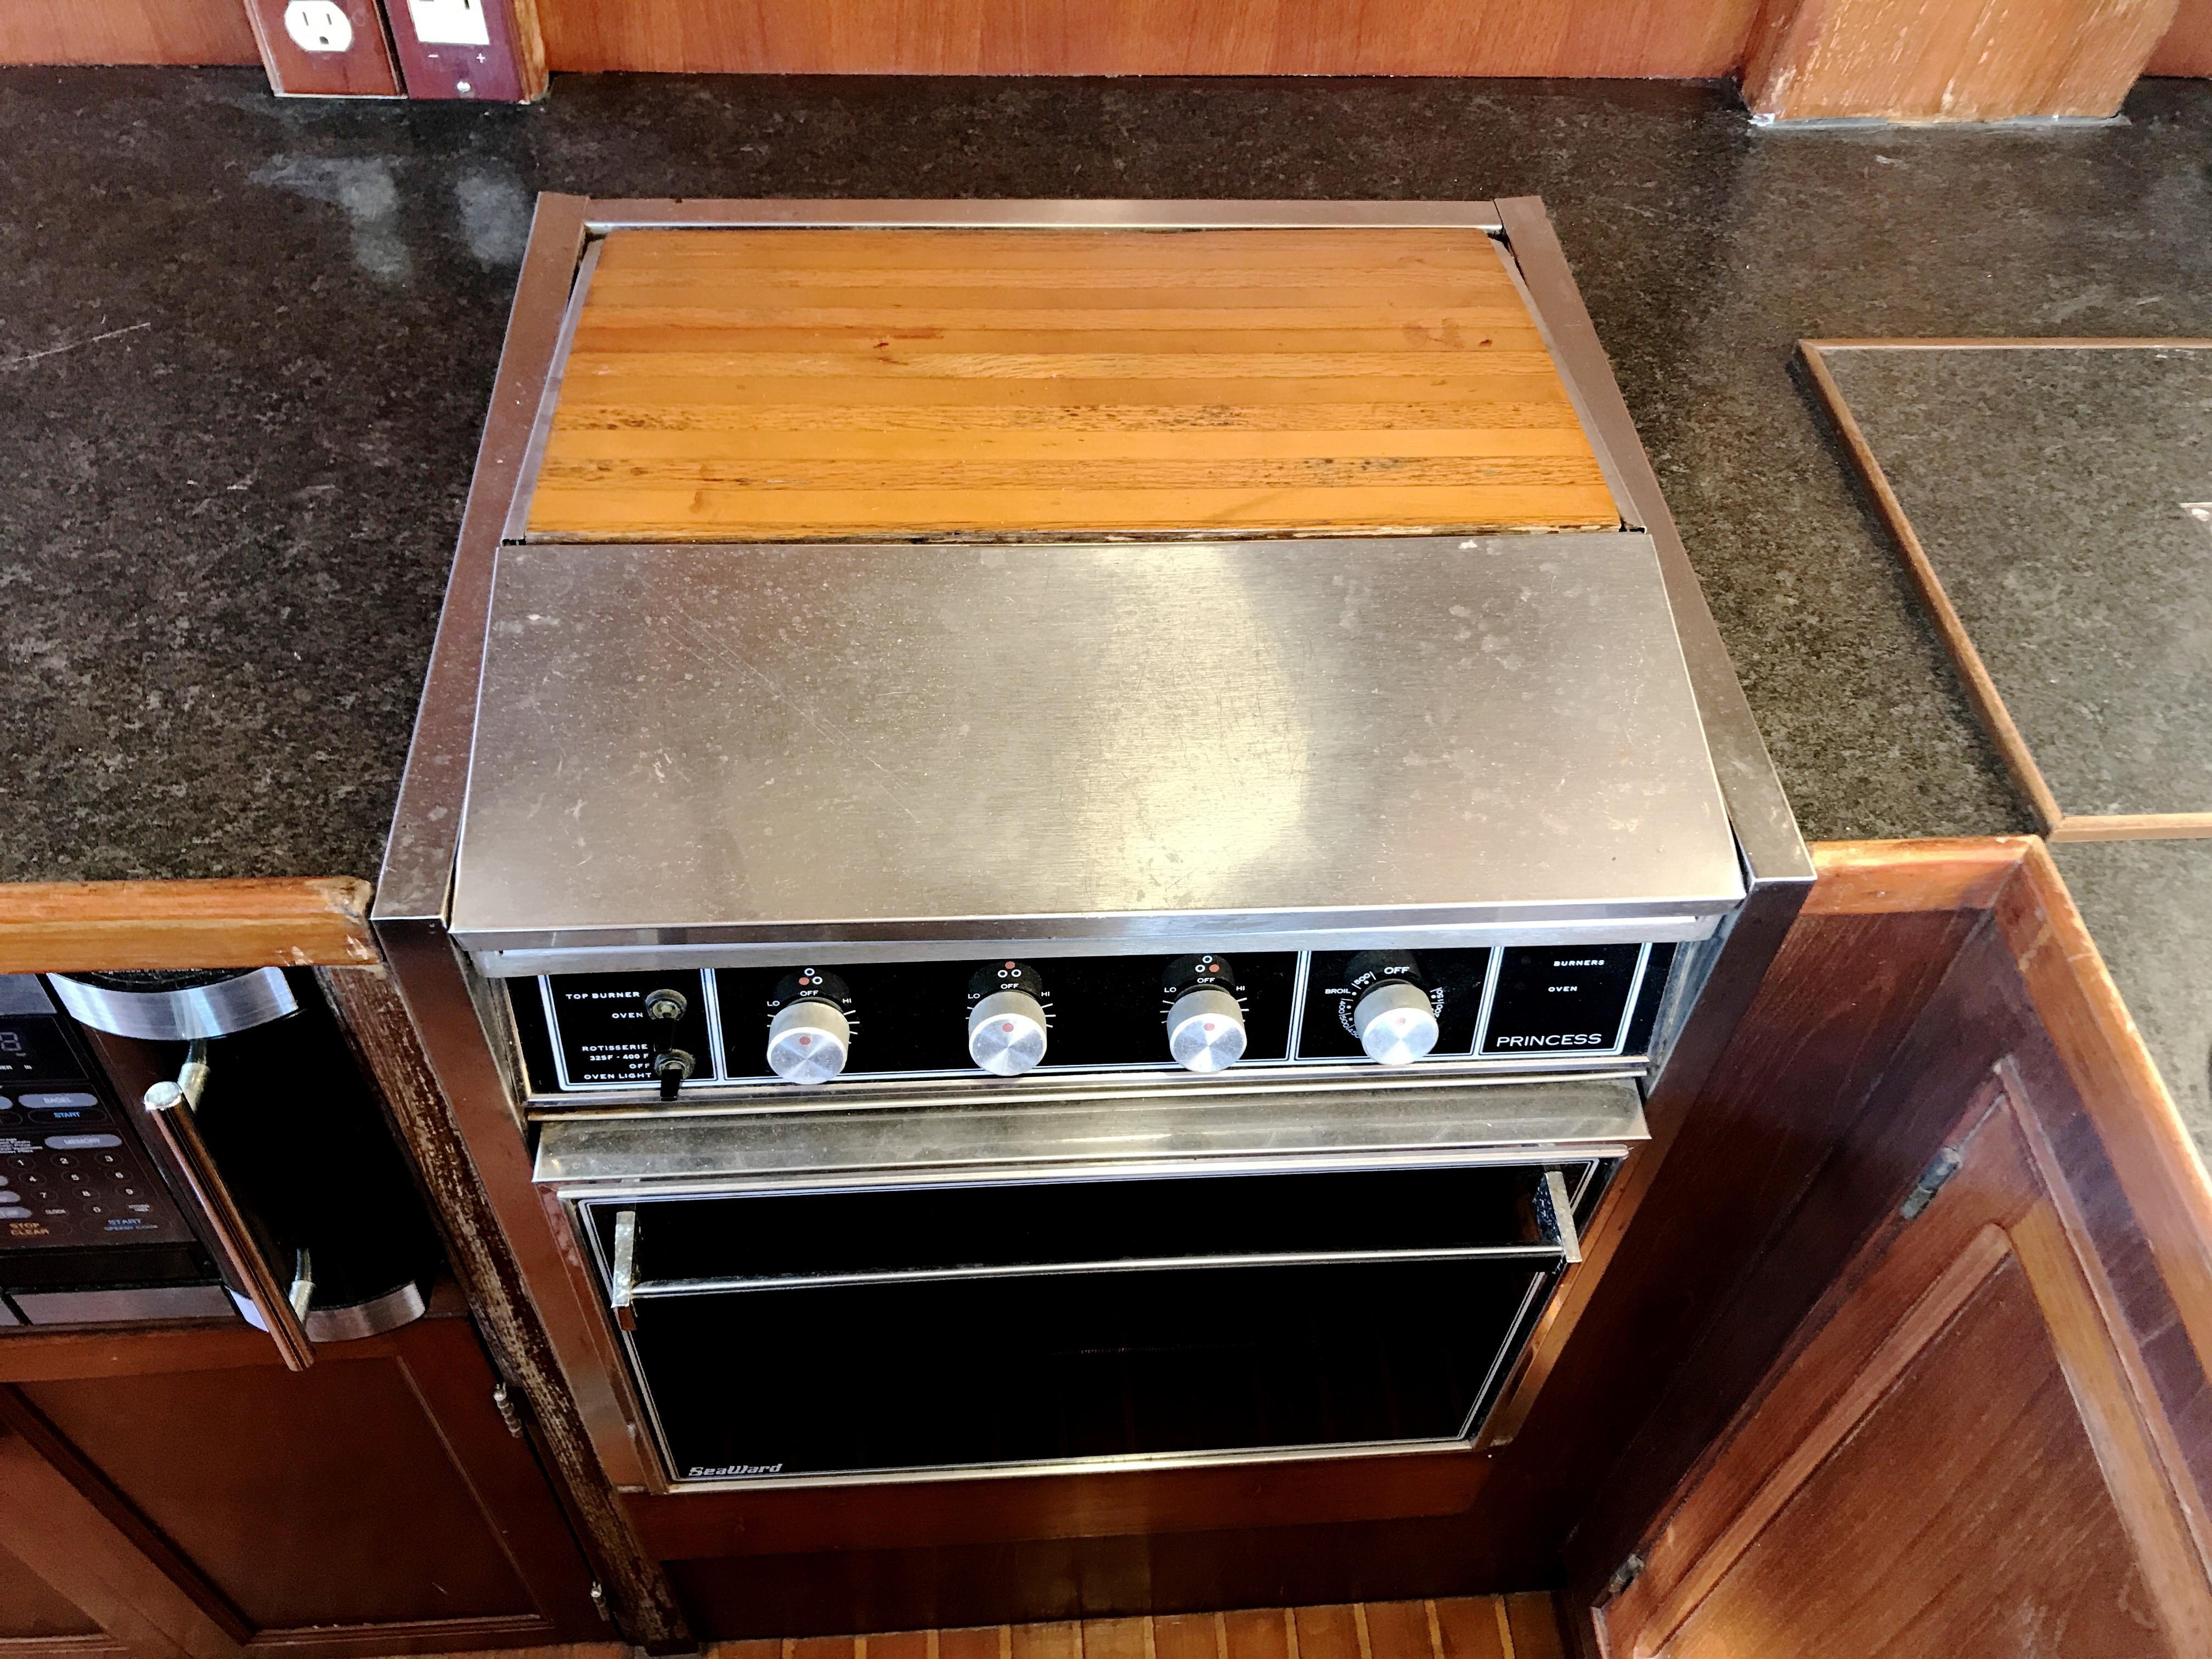 Sea Ranger SUNDECK - oven and 3-burner stove